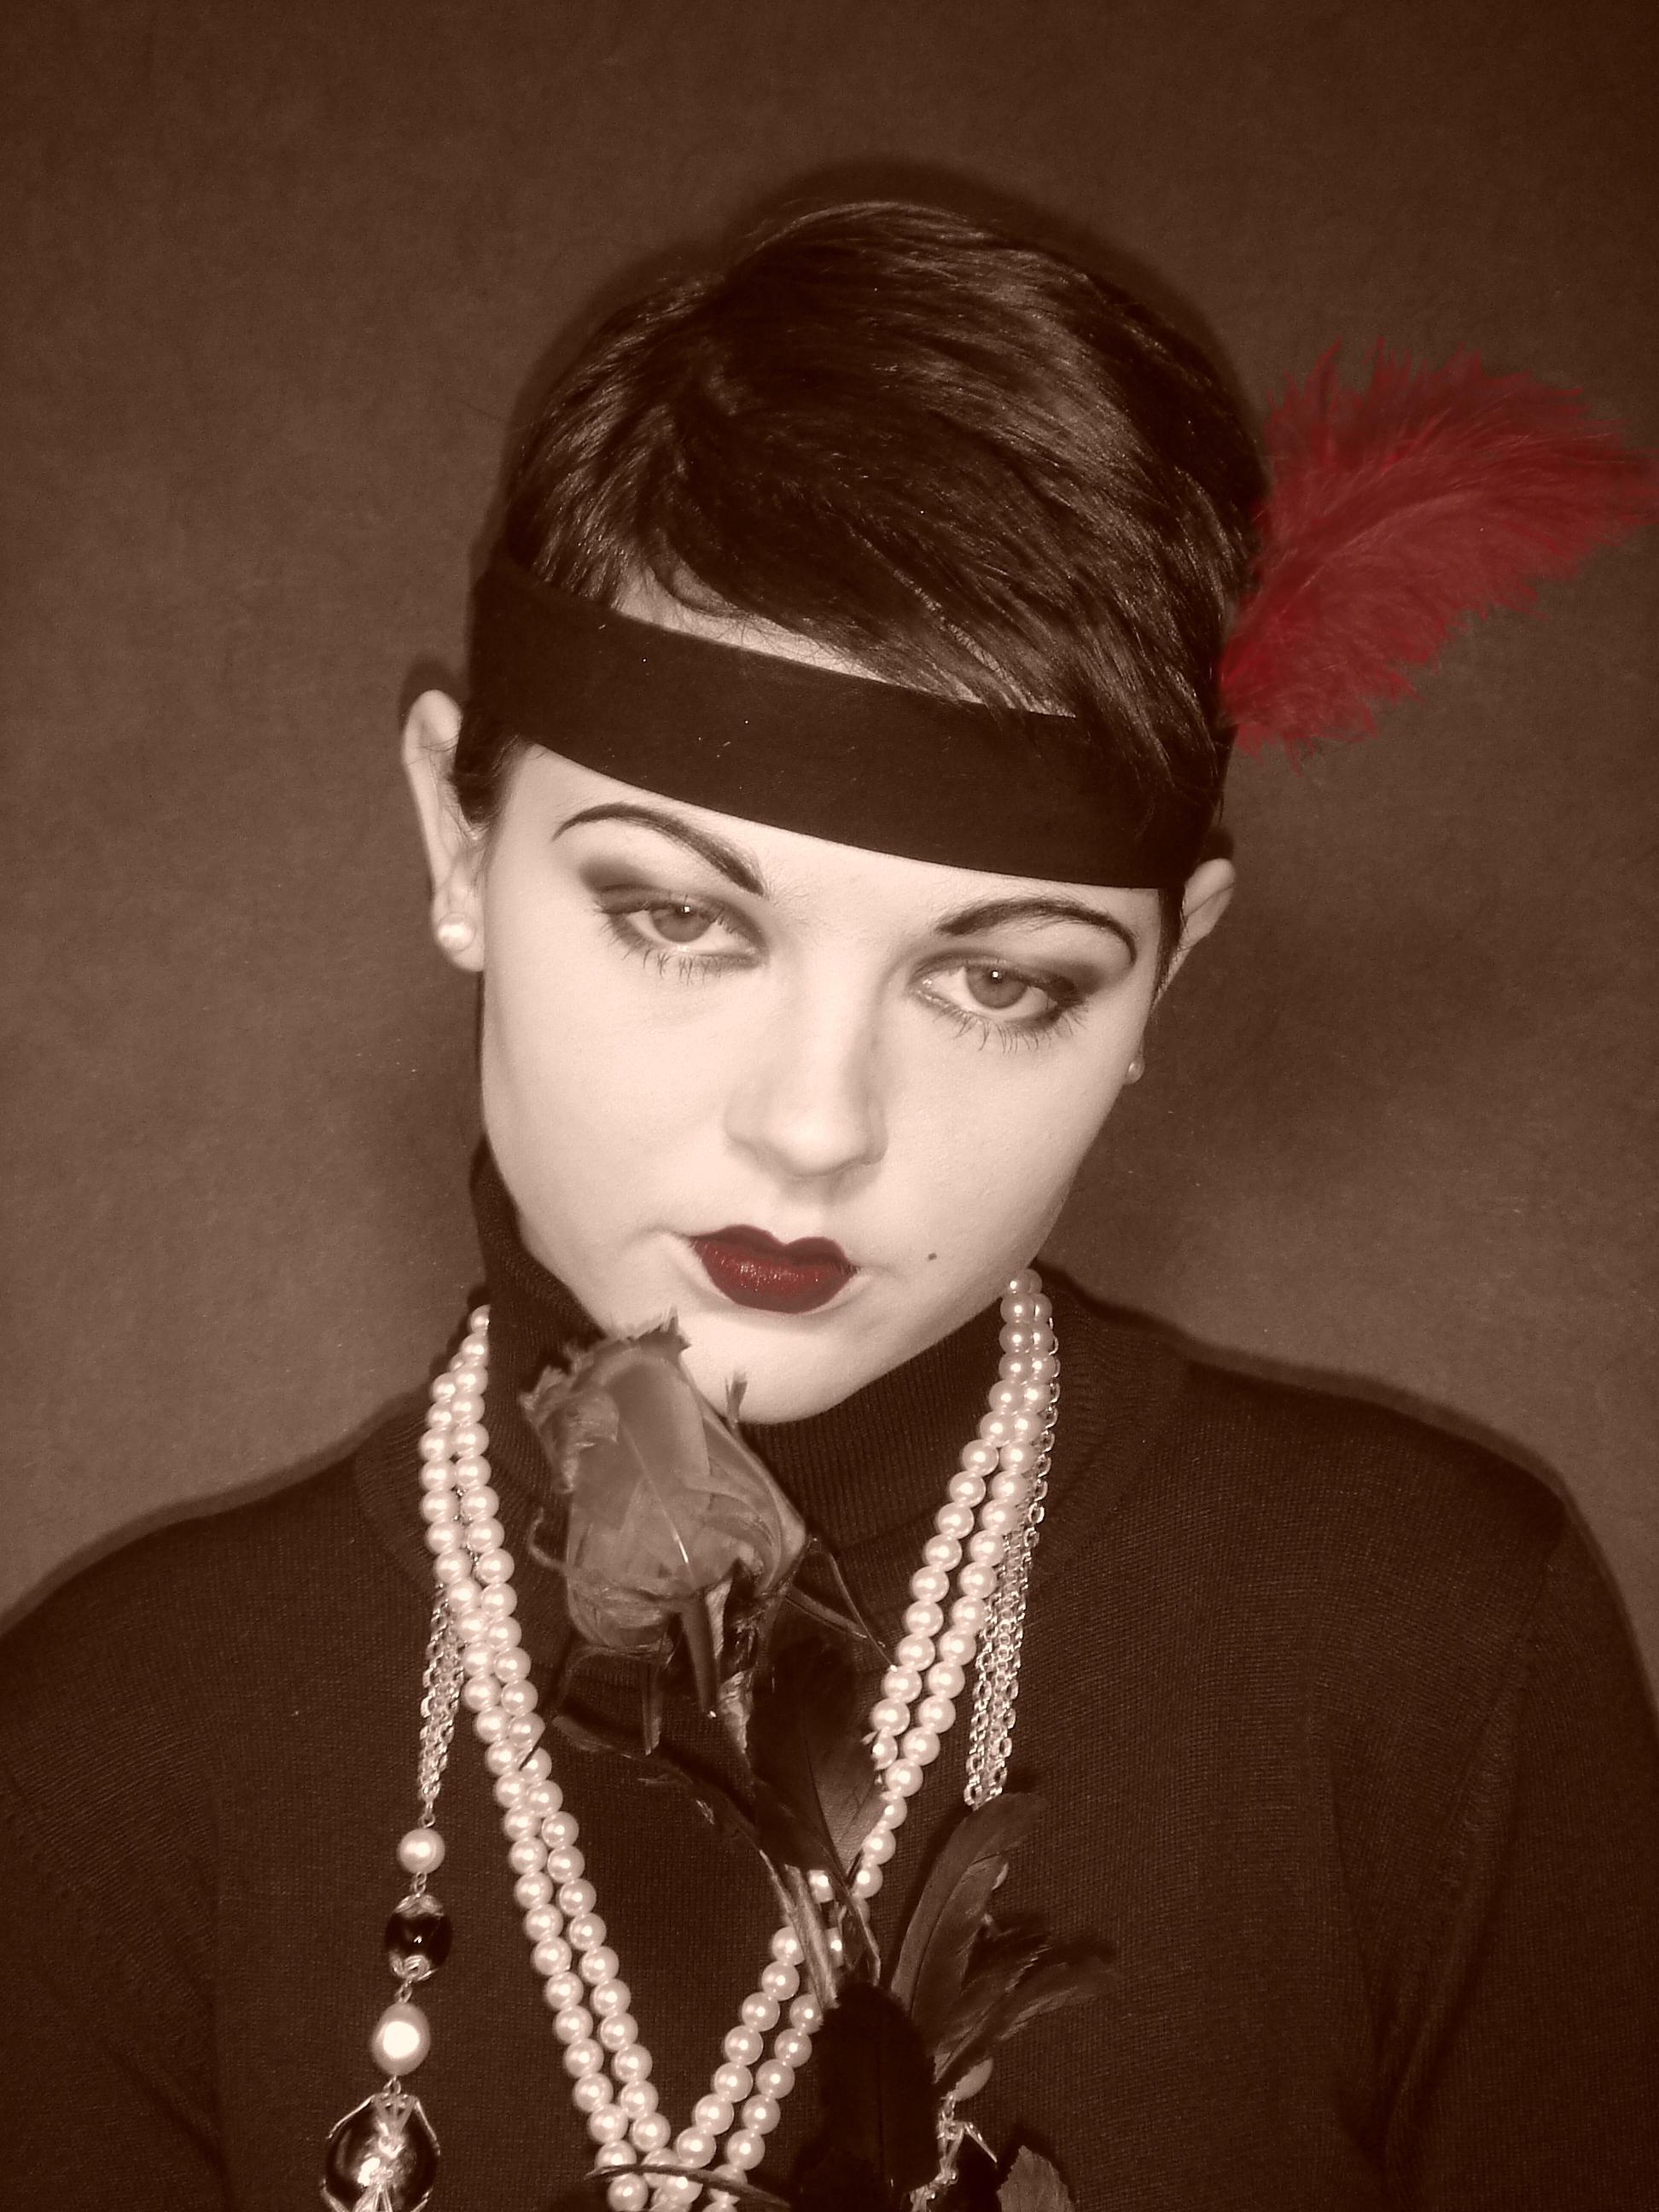 Maquillage annee 20 by trolounette on deviantart - Maquillage annee 20 ...